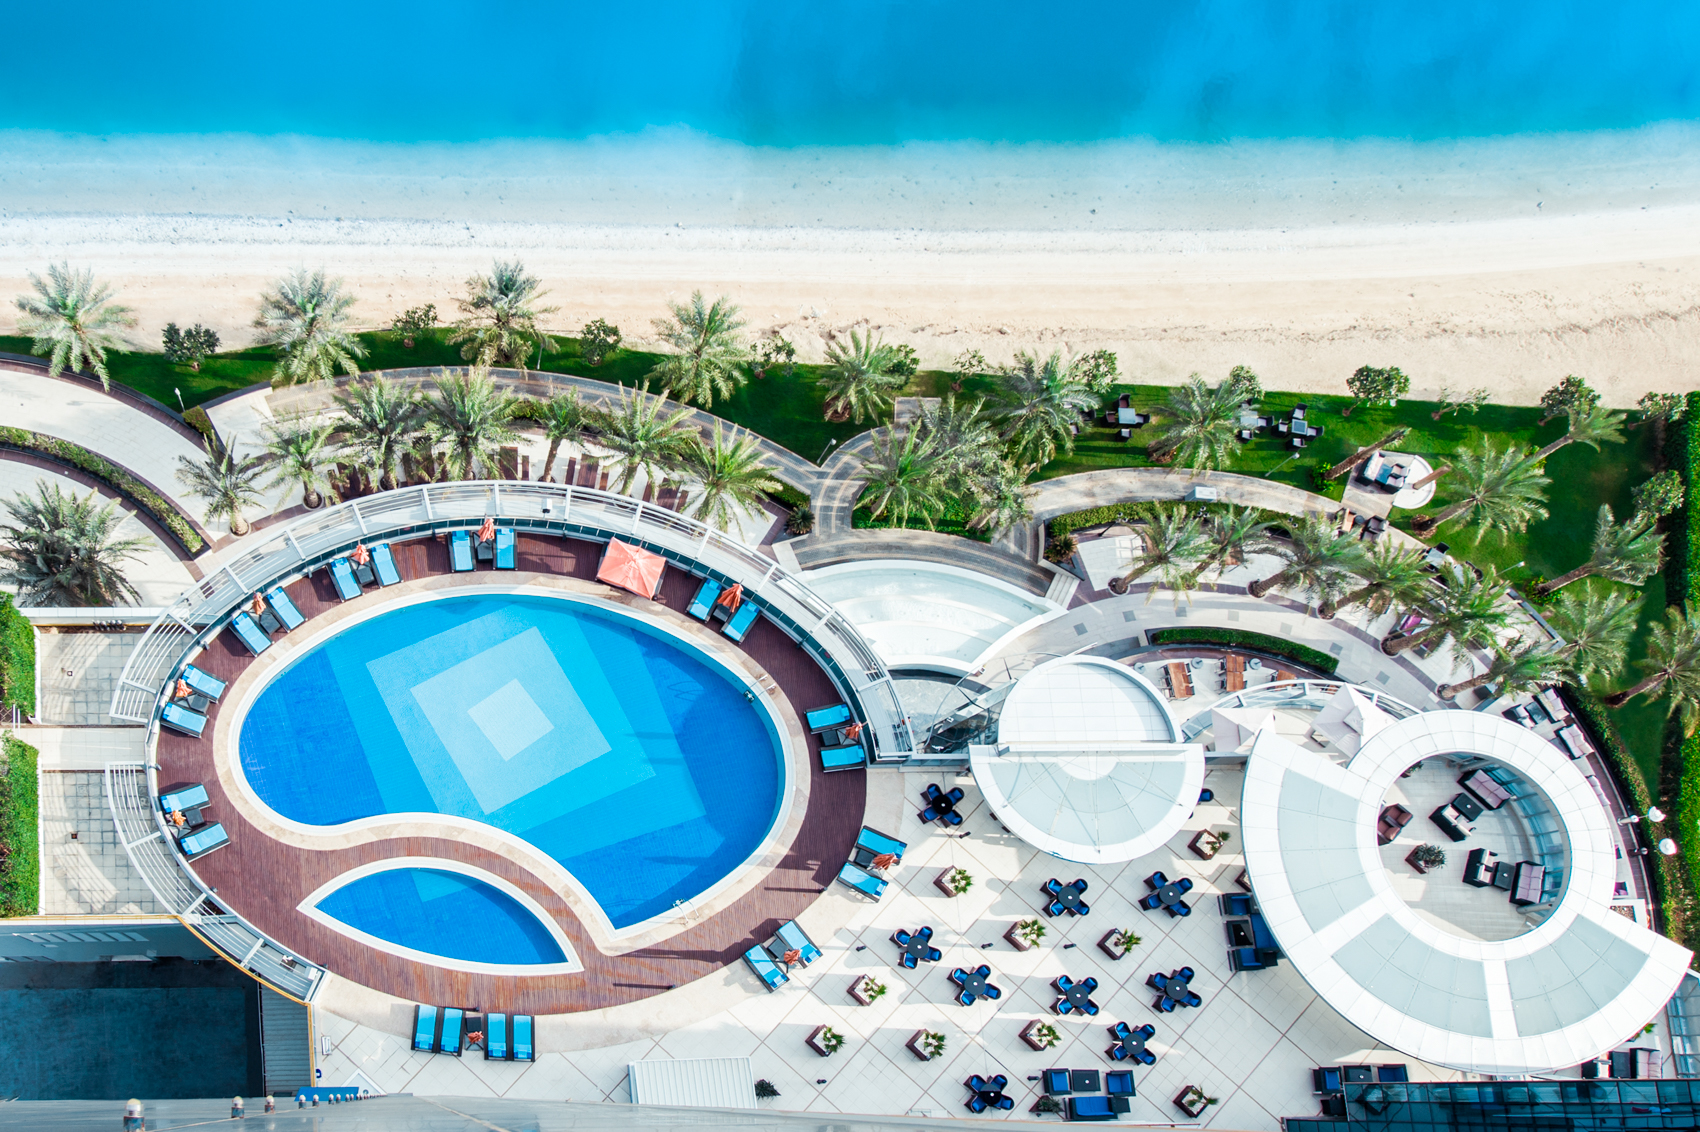 Agence Photographie hôtelière : Novotel Abu Dhabi Gate